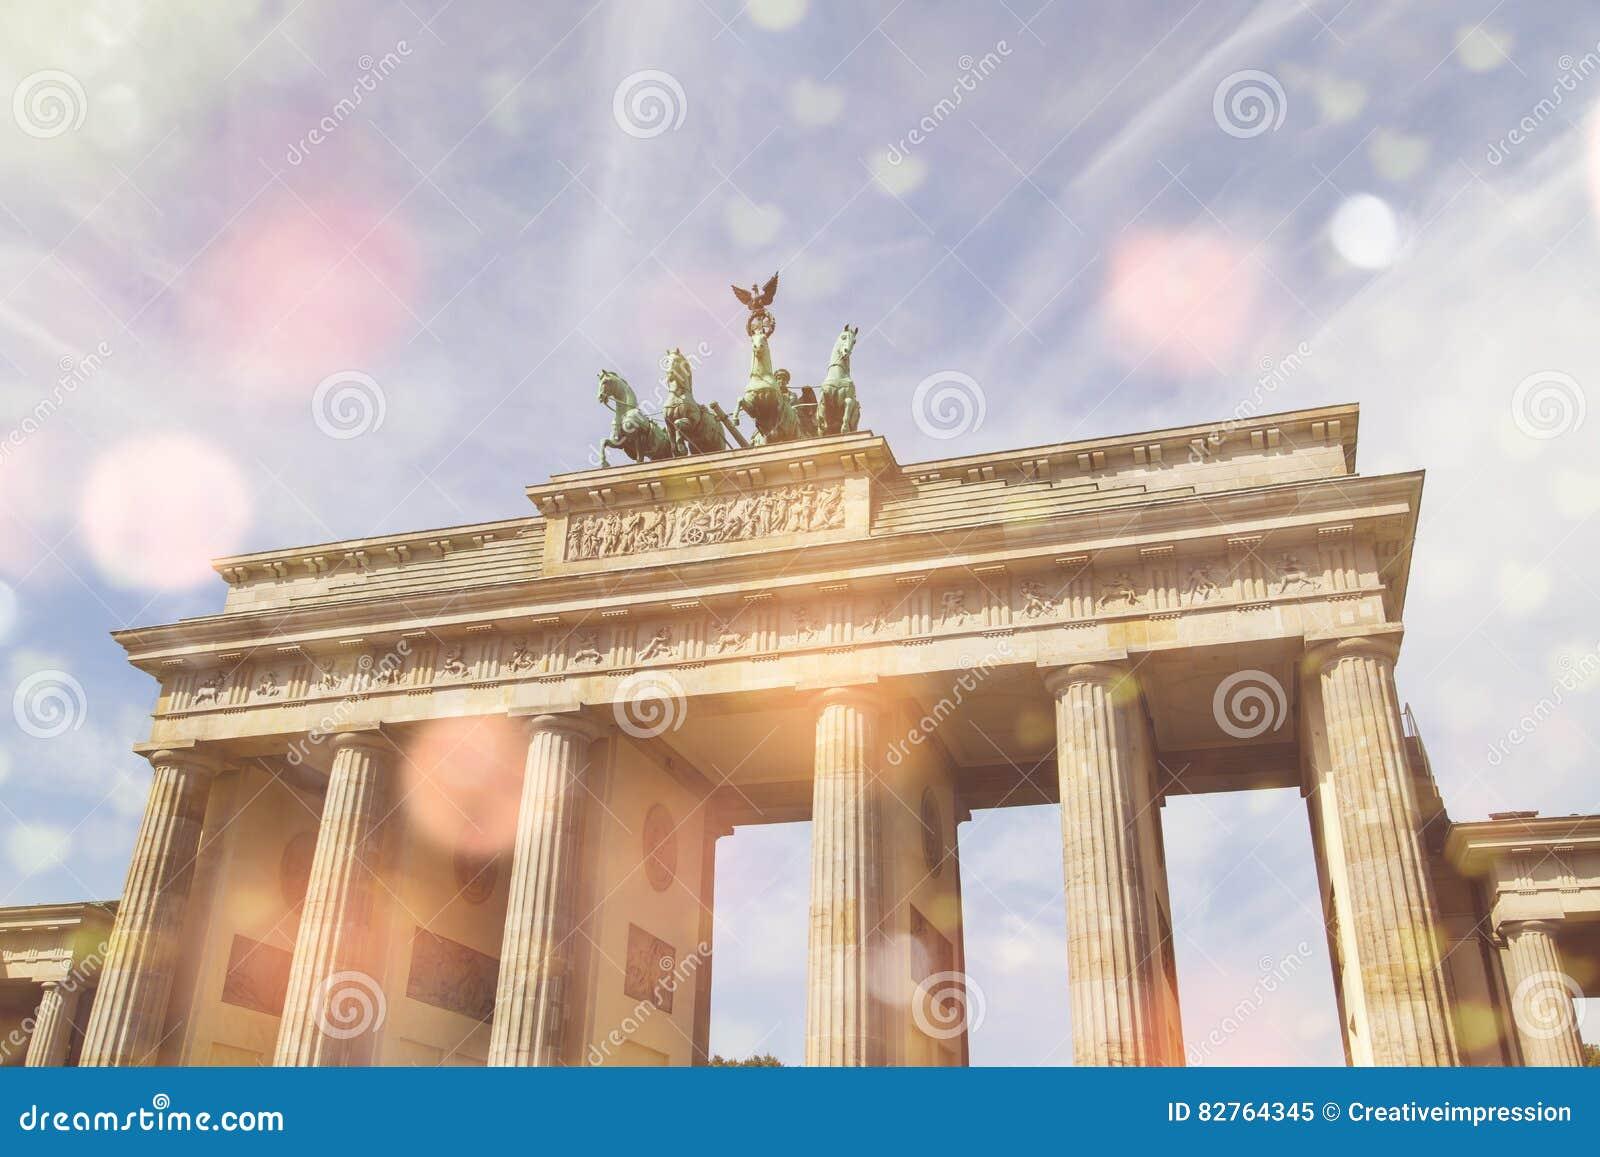 Porte et lighteffects de Brandenburger